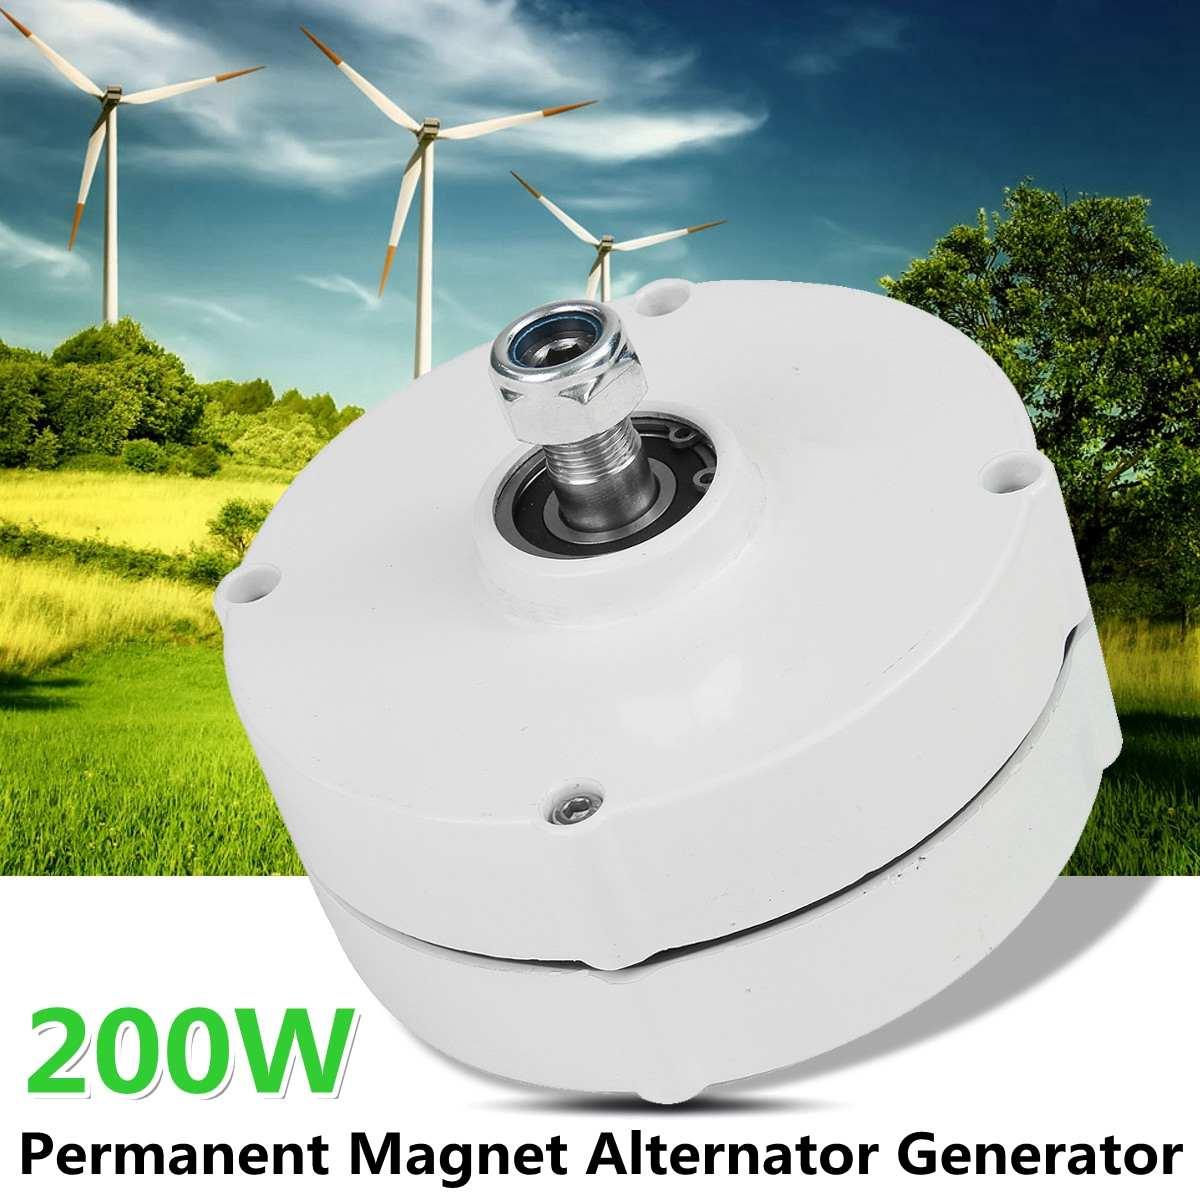 200W 600r/m 12/24V Permanent Magnet Generator AC Alternator for Vertical or Horizontal Wind T urbine 200W Wind Generator200W 600r/m 12/24V Permanent Magnet Generator AC Alternator for Vertical or Horizontal Wind T urbine 200W Wind Generator